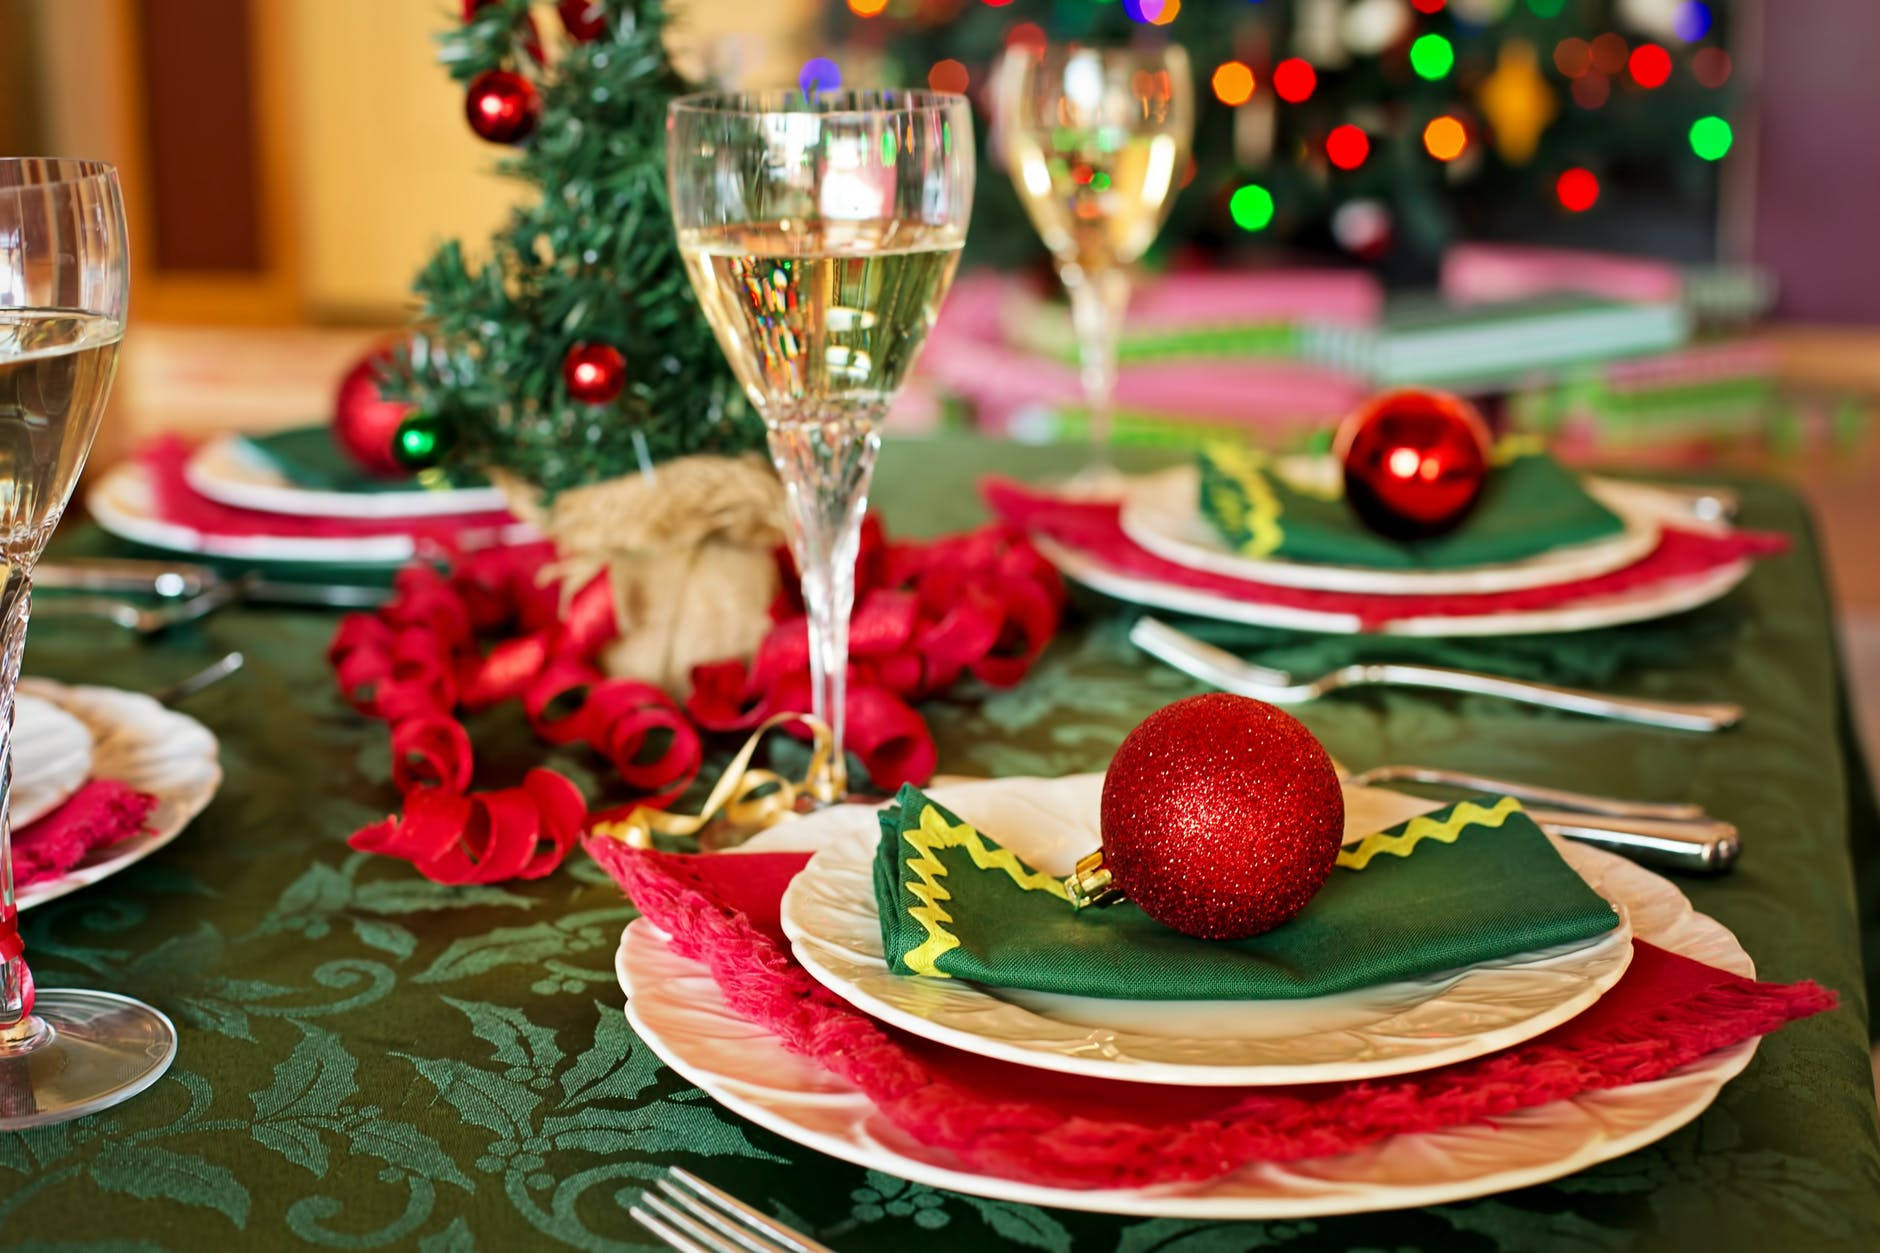 candle celebration champagne christmas